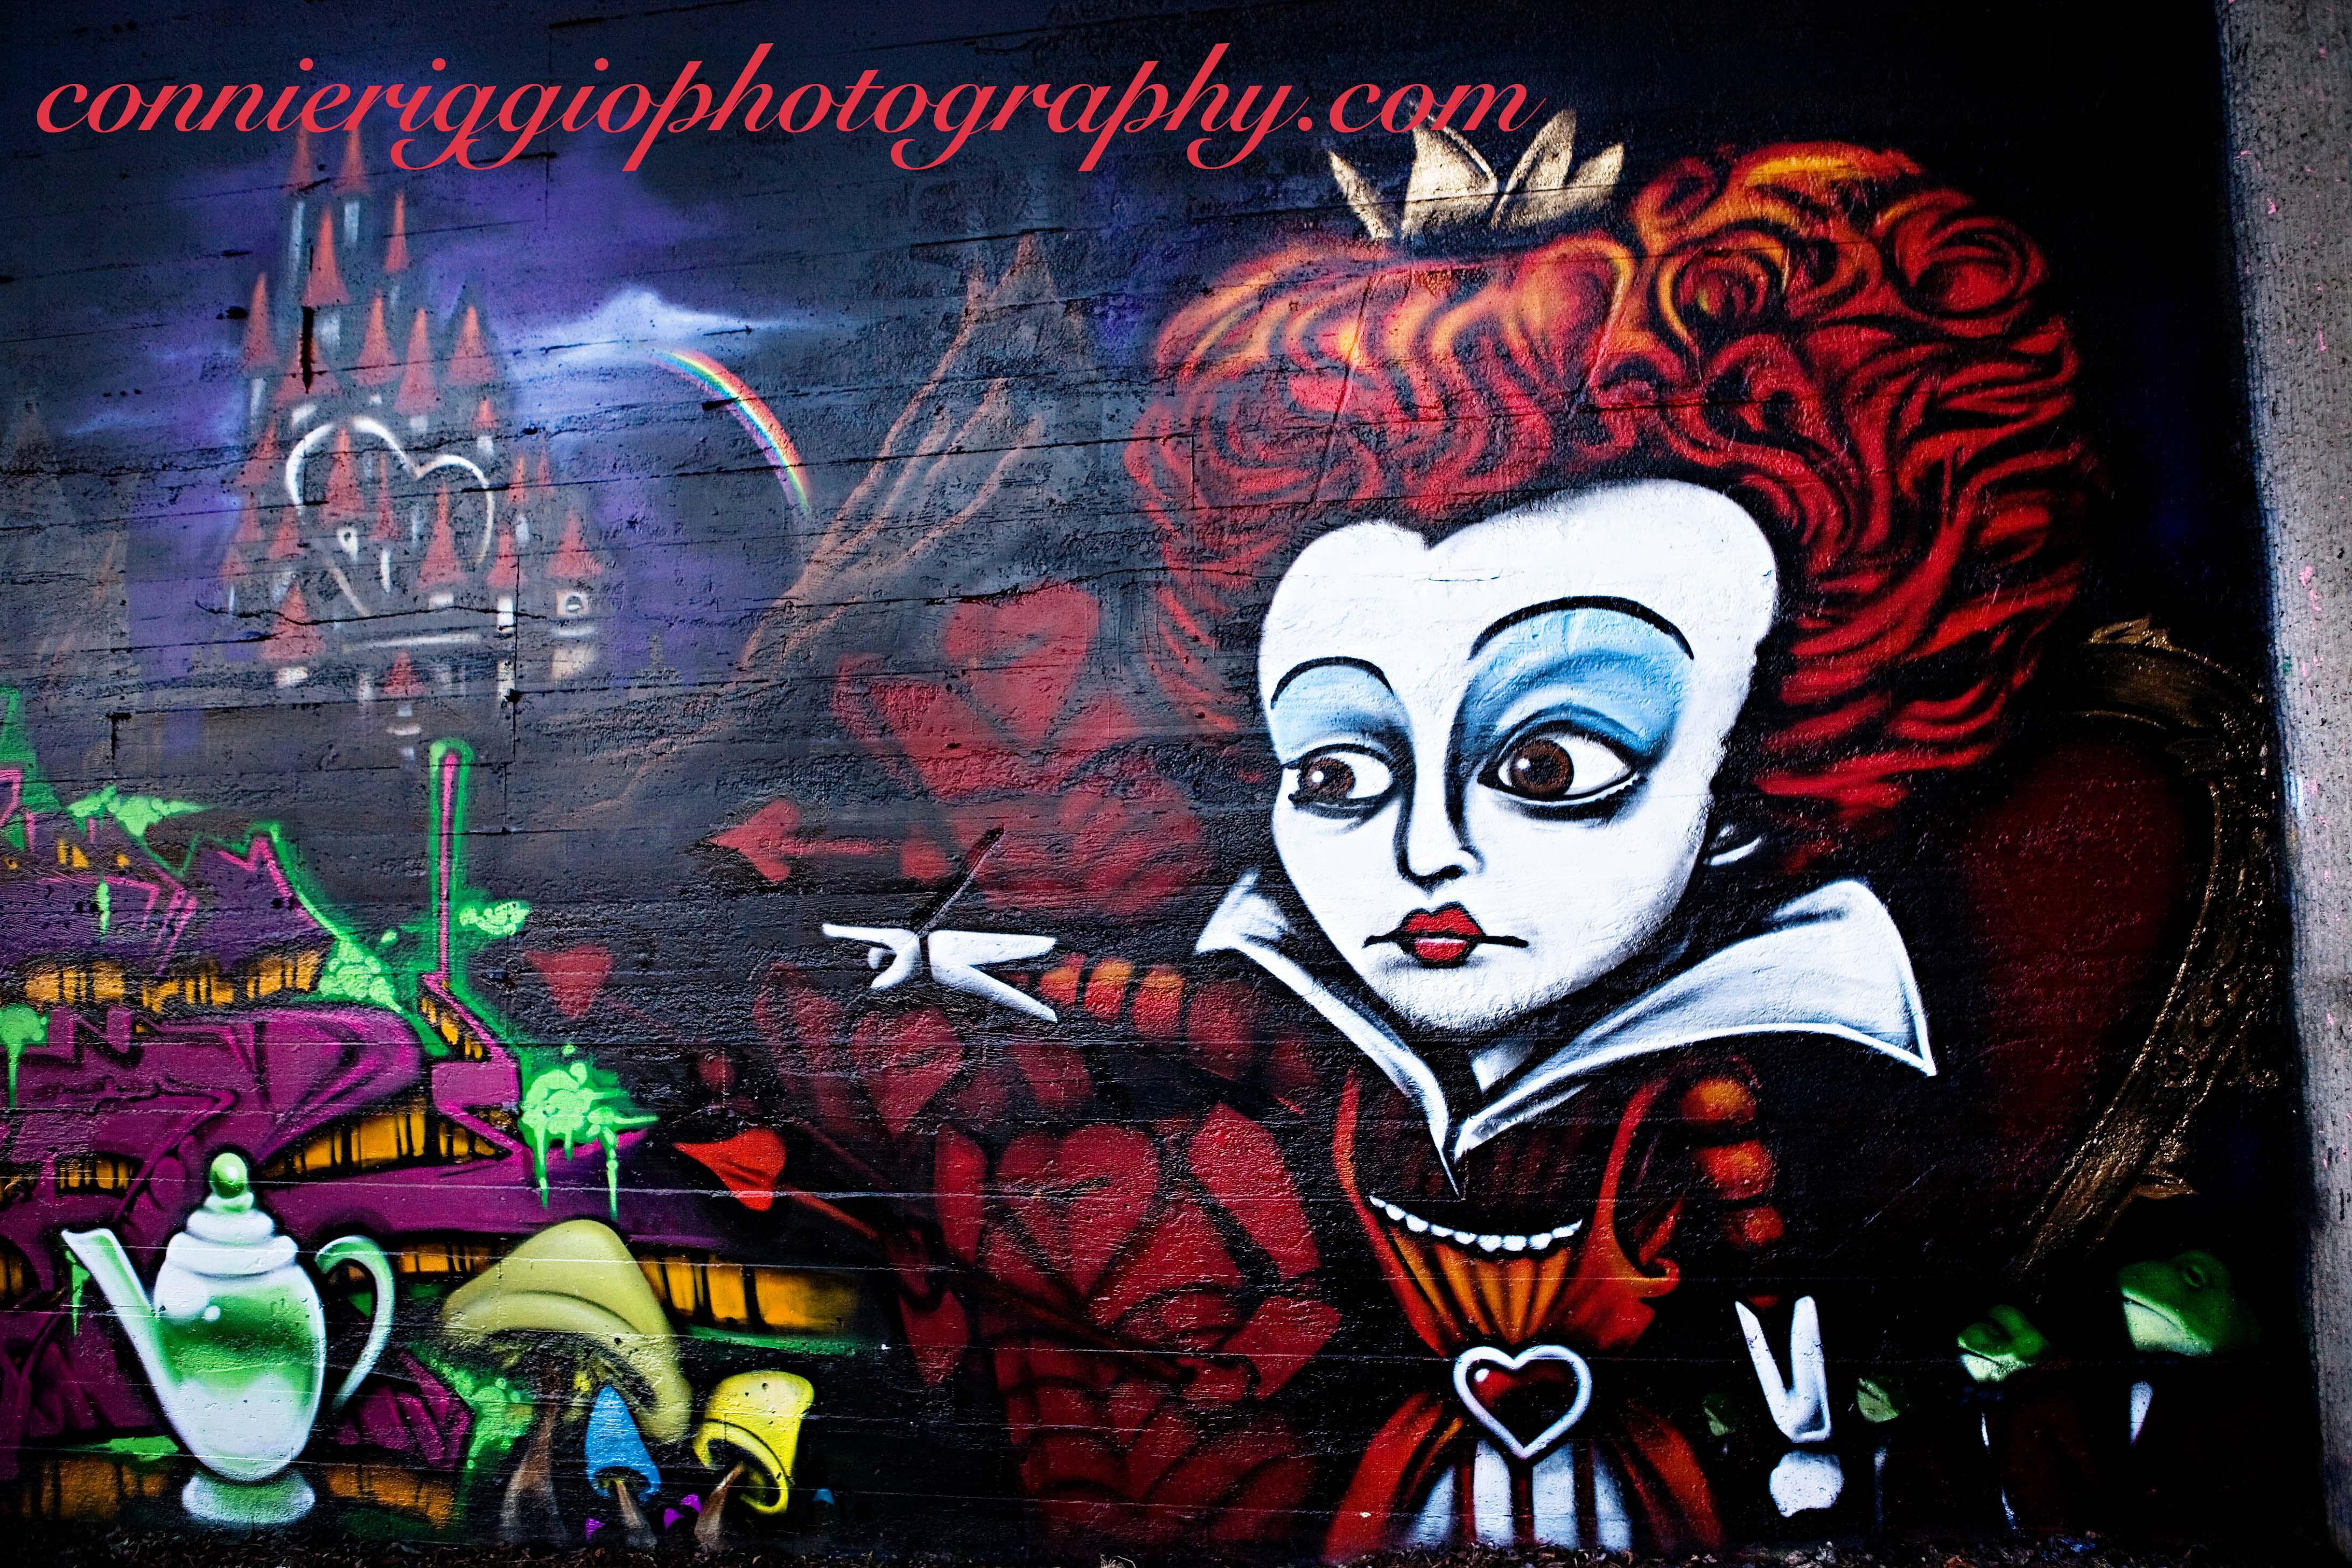 Graffiti Wall – Alice in Wonderland Update